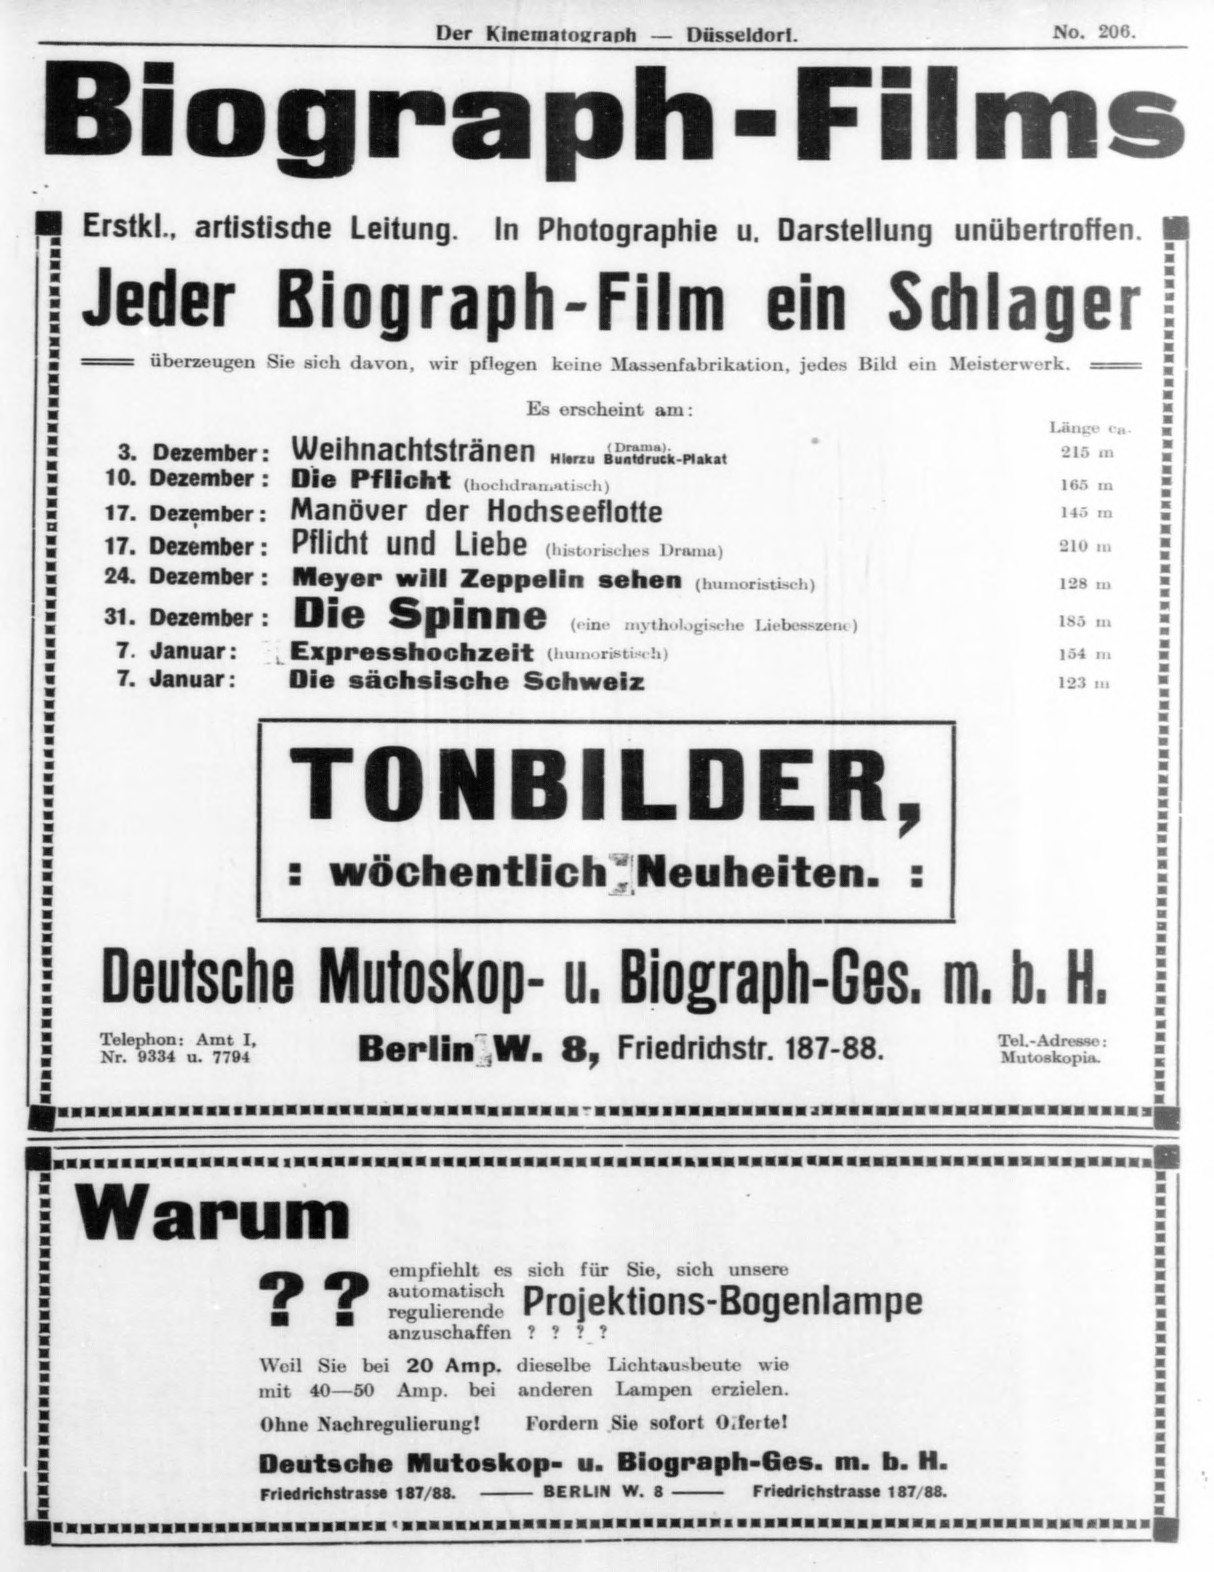 Kinematograph04-1910-12_jp2.zip&file=kinematograph04-1910-12_jp2%2fkinematograph04-1910-12_0006